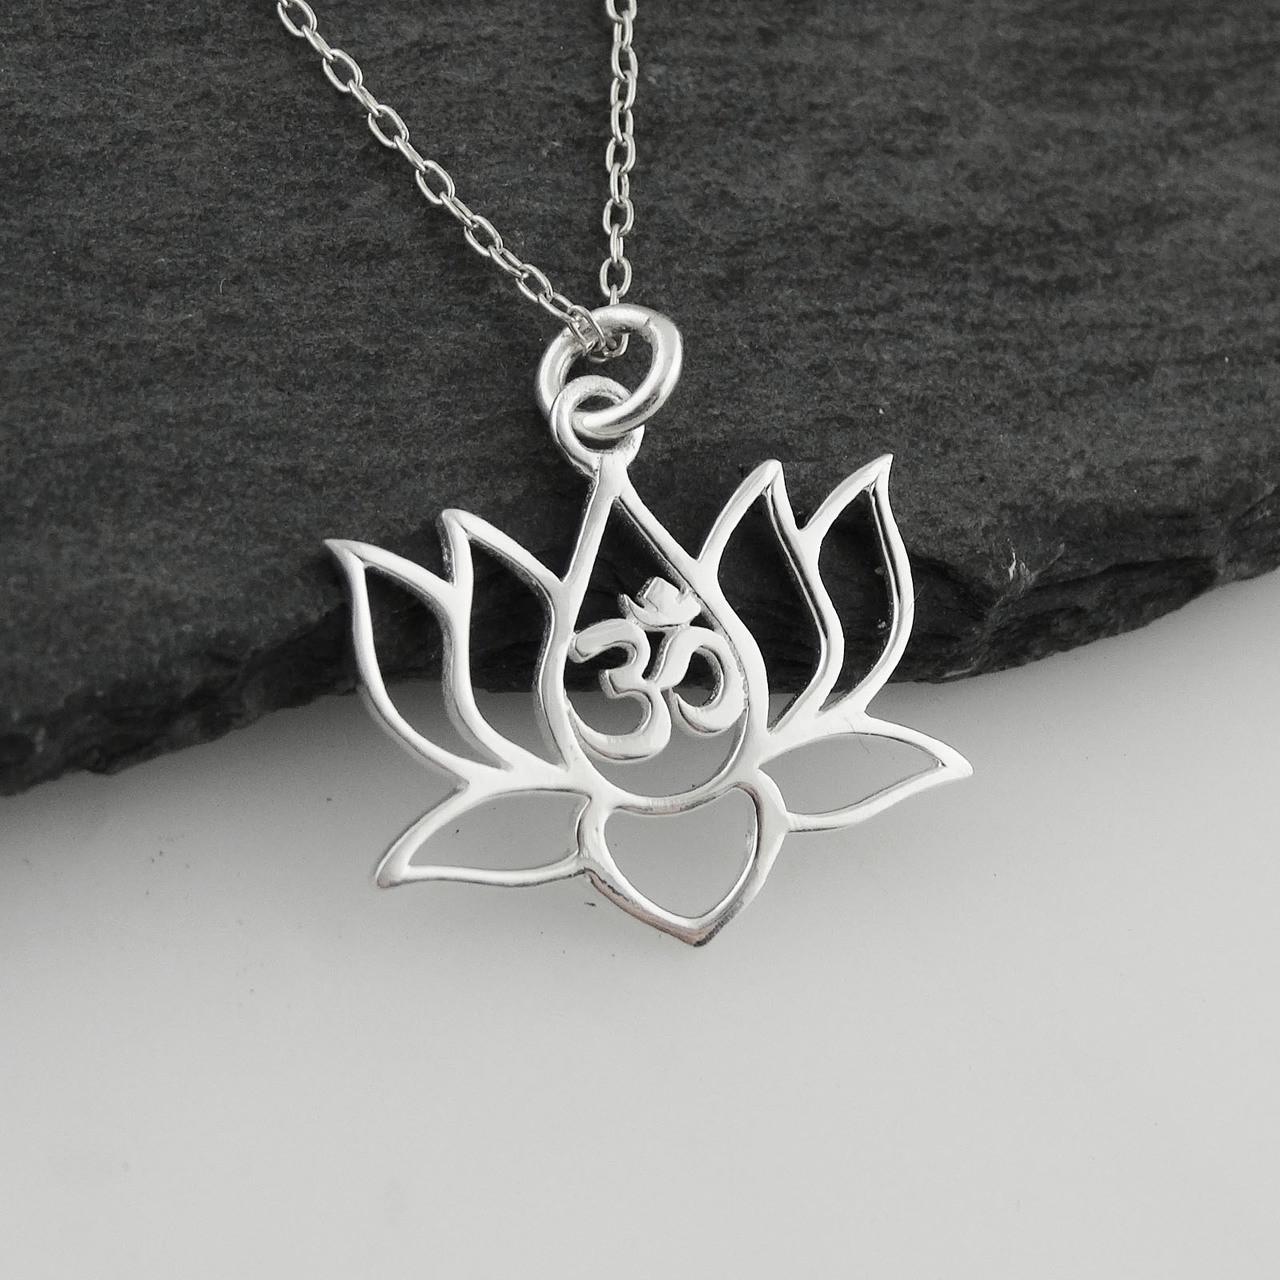 Lotus flower w om cutout necklace 925 sterling silver lotus flower w om cutout necklace 925 sterling silver izmirmasajfo